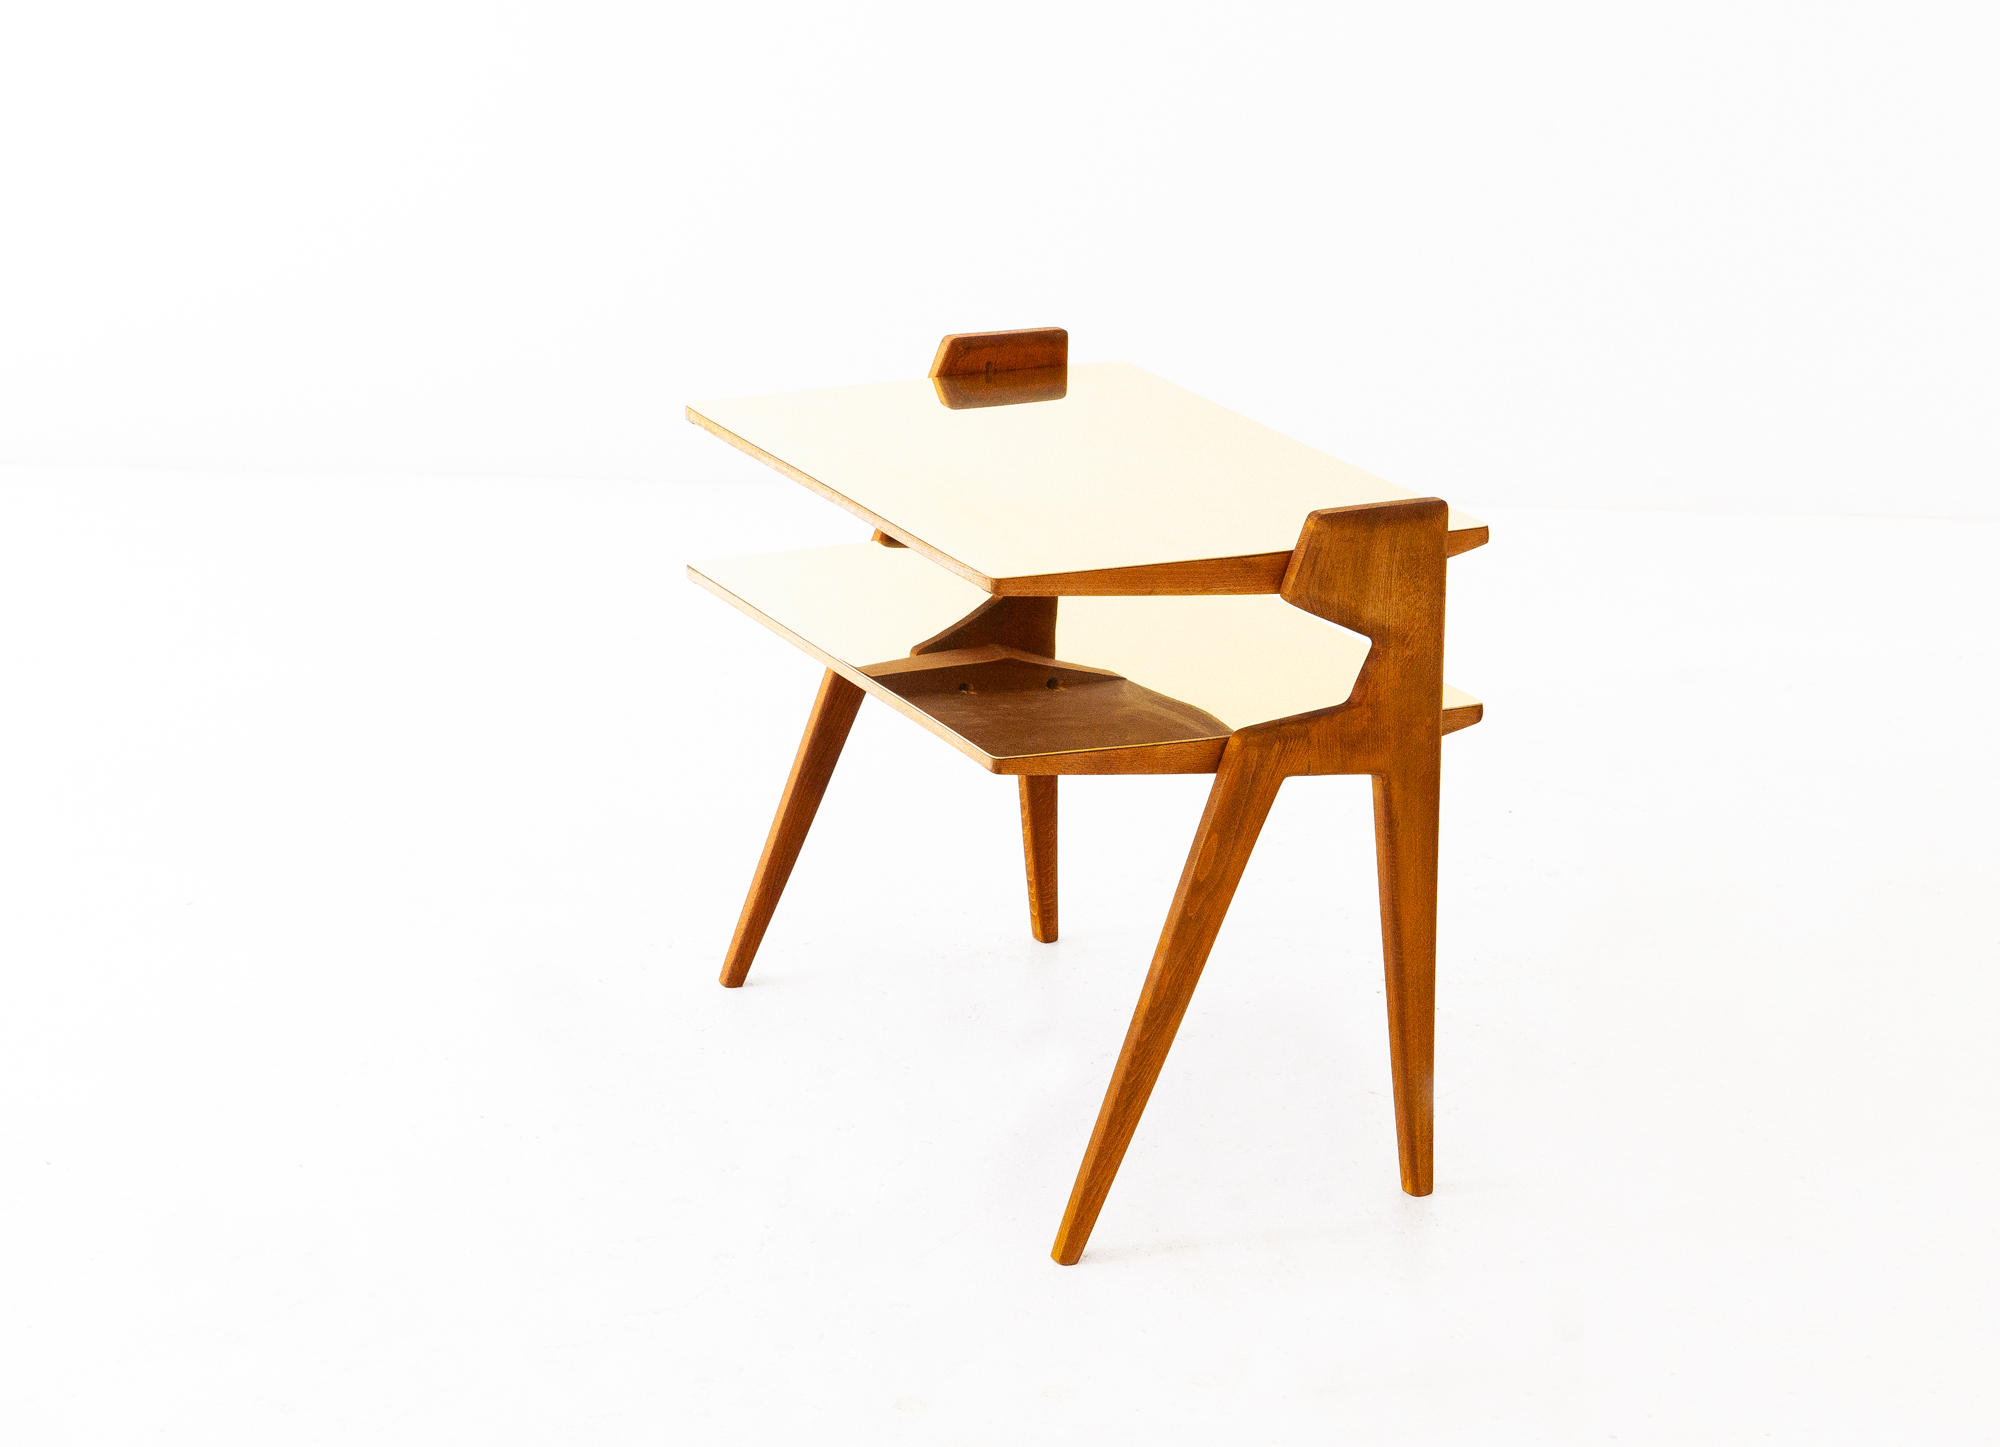 1950s-italian-brass-light-wood-two-levels-side-table-4-t81